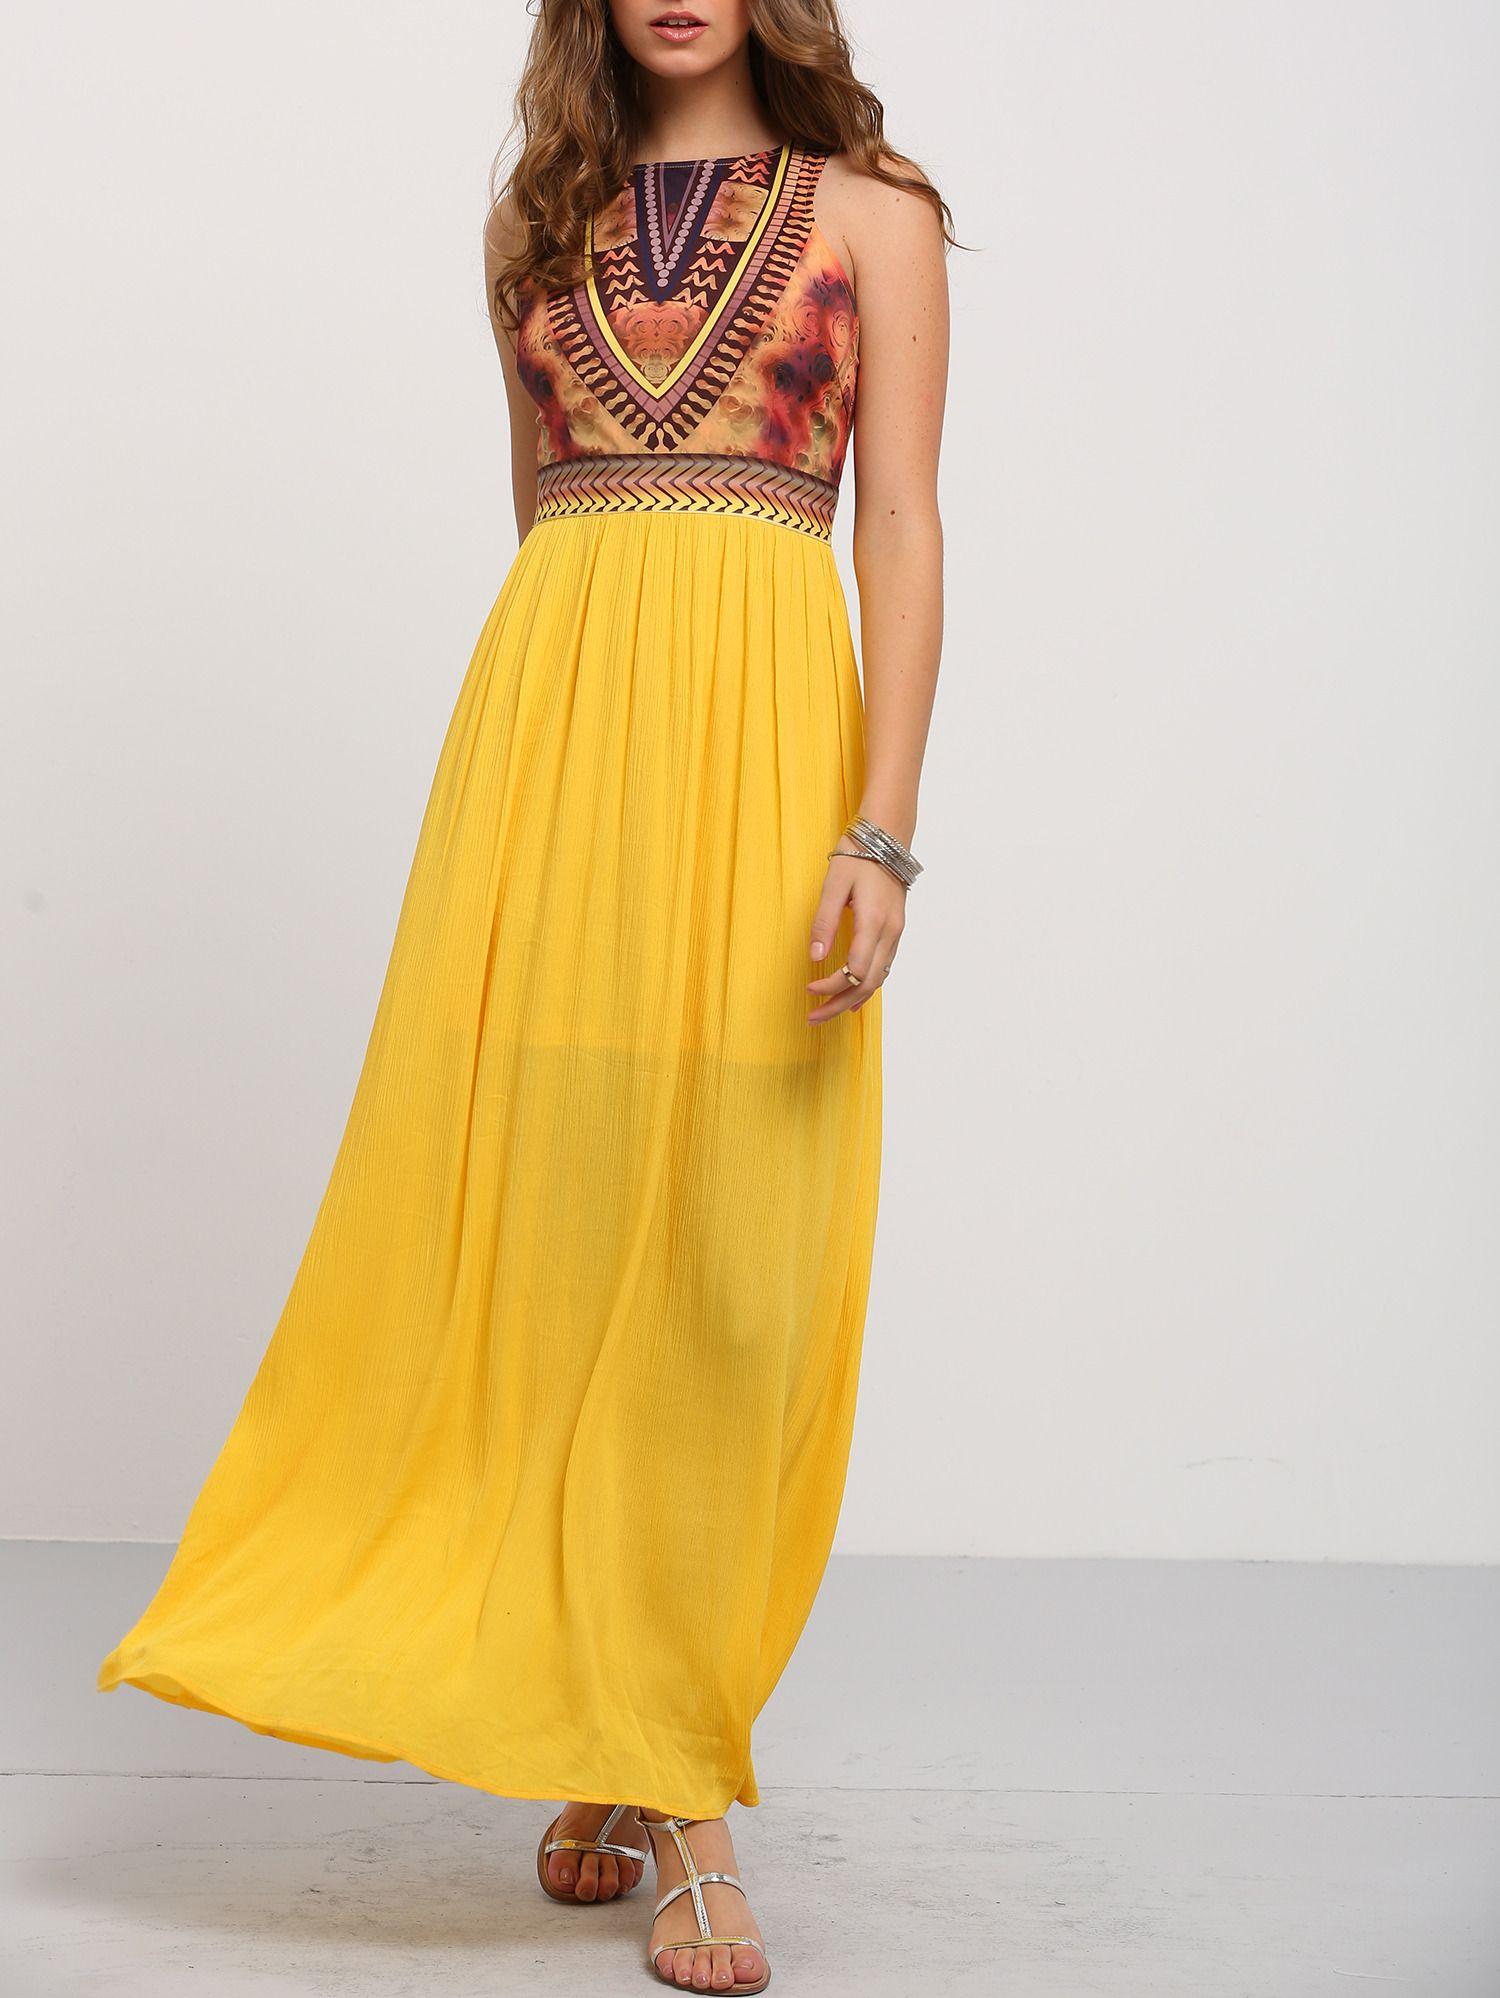 Golden+Sleeveless+Vintage+Print+Maxi+Dress+26.99